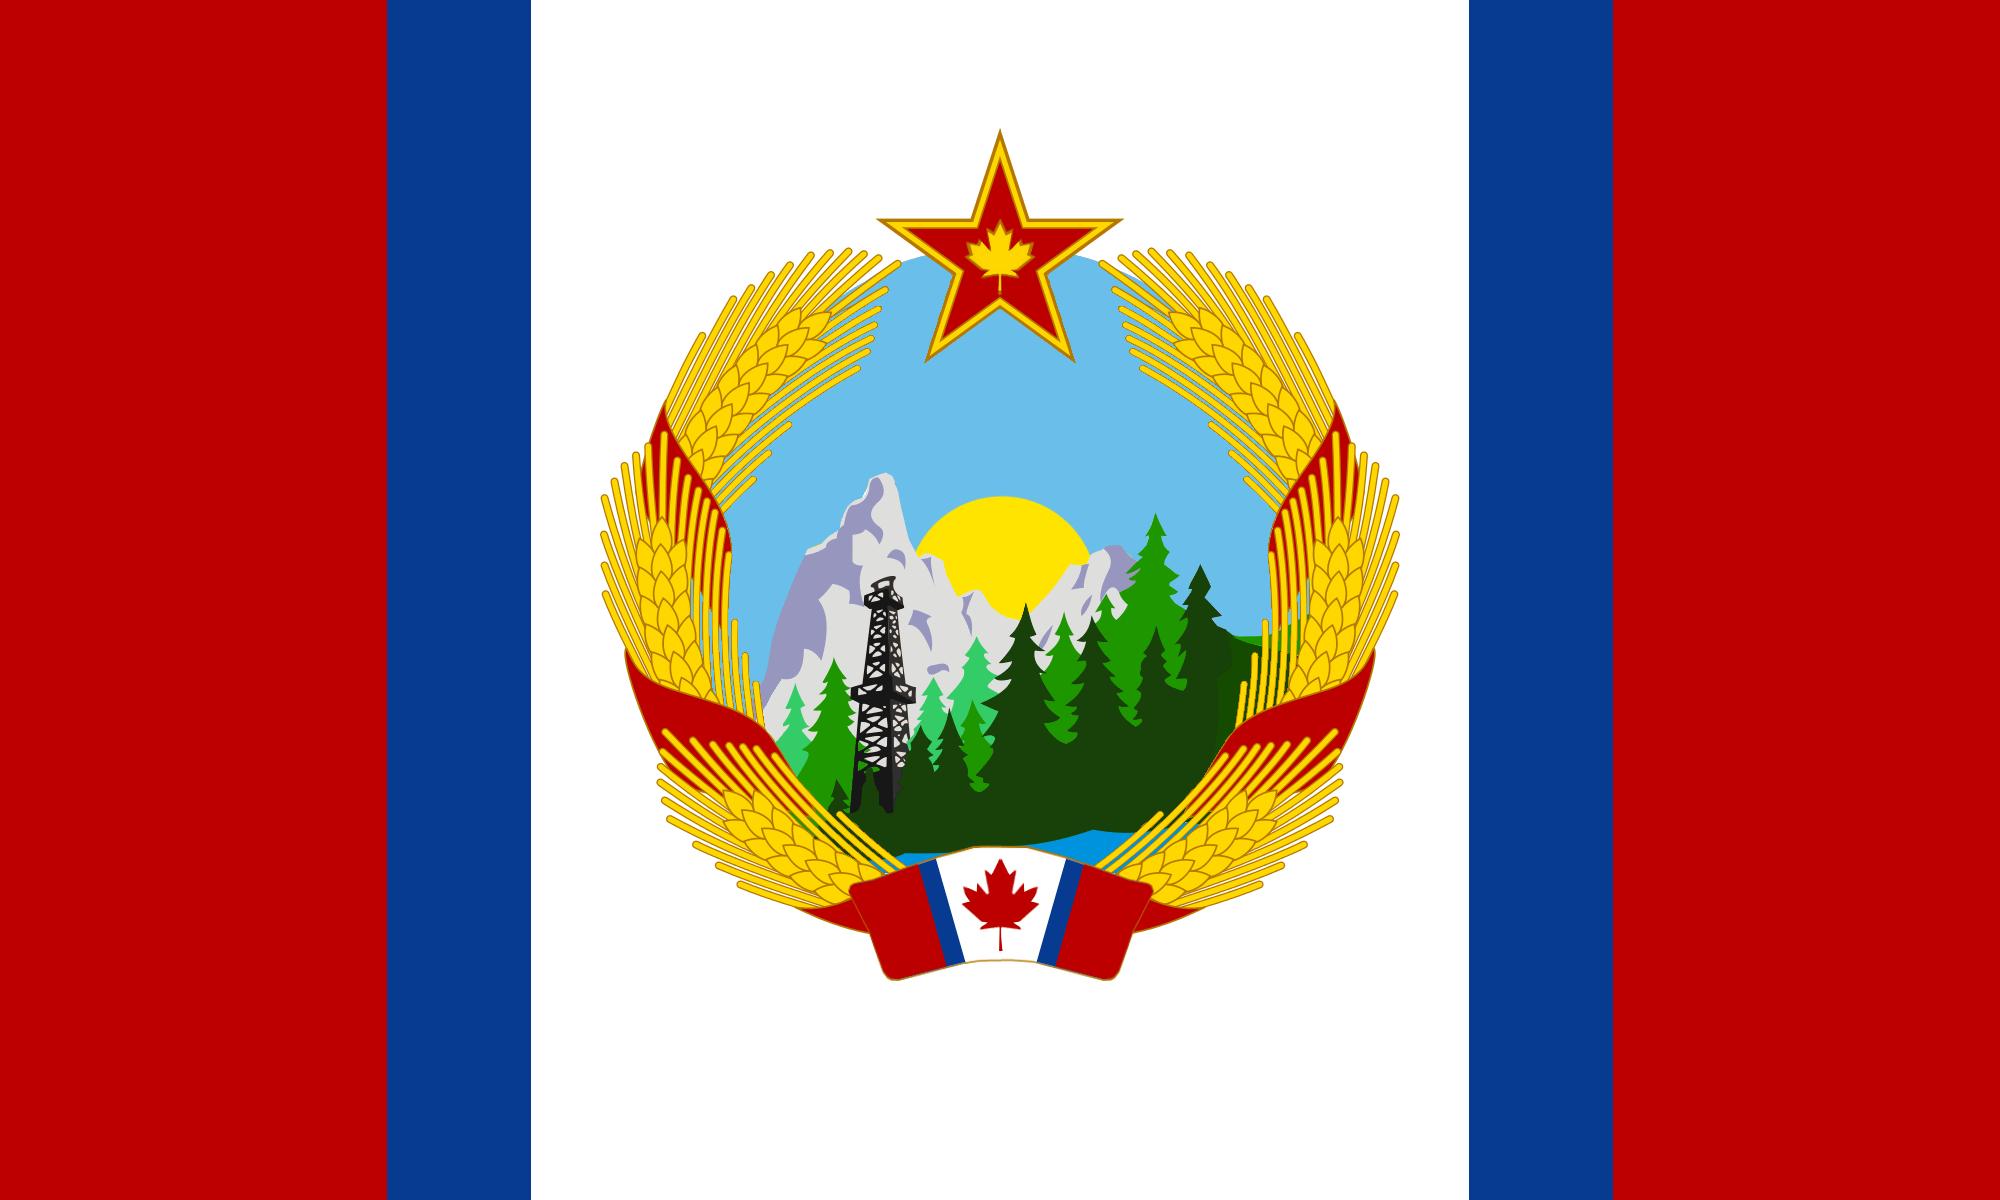 A Communist Canadian Flag : vexillology